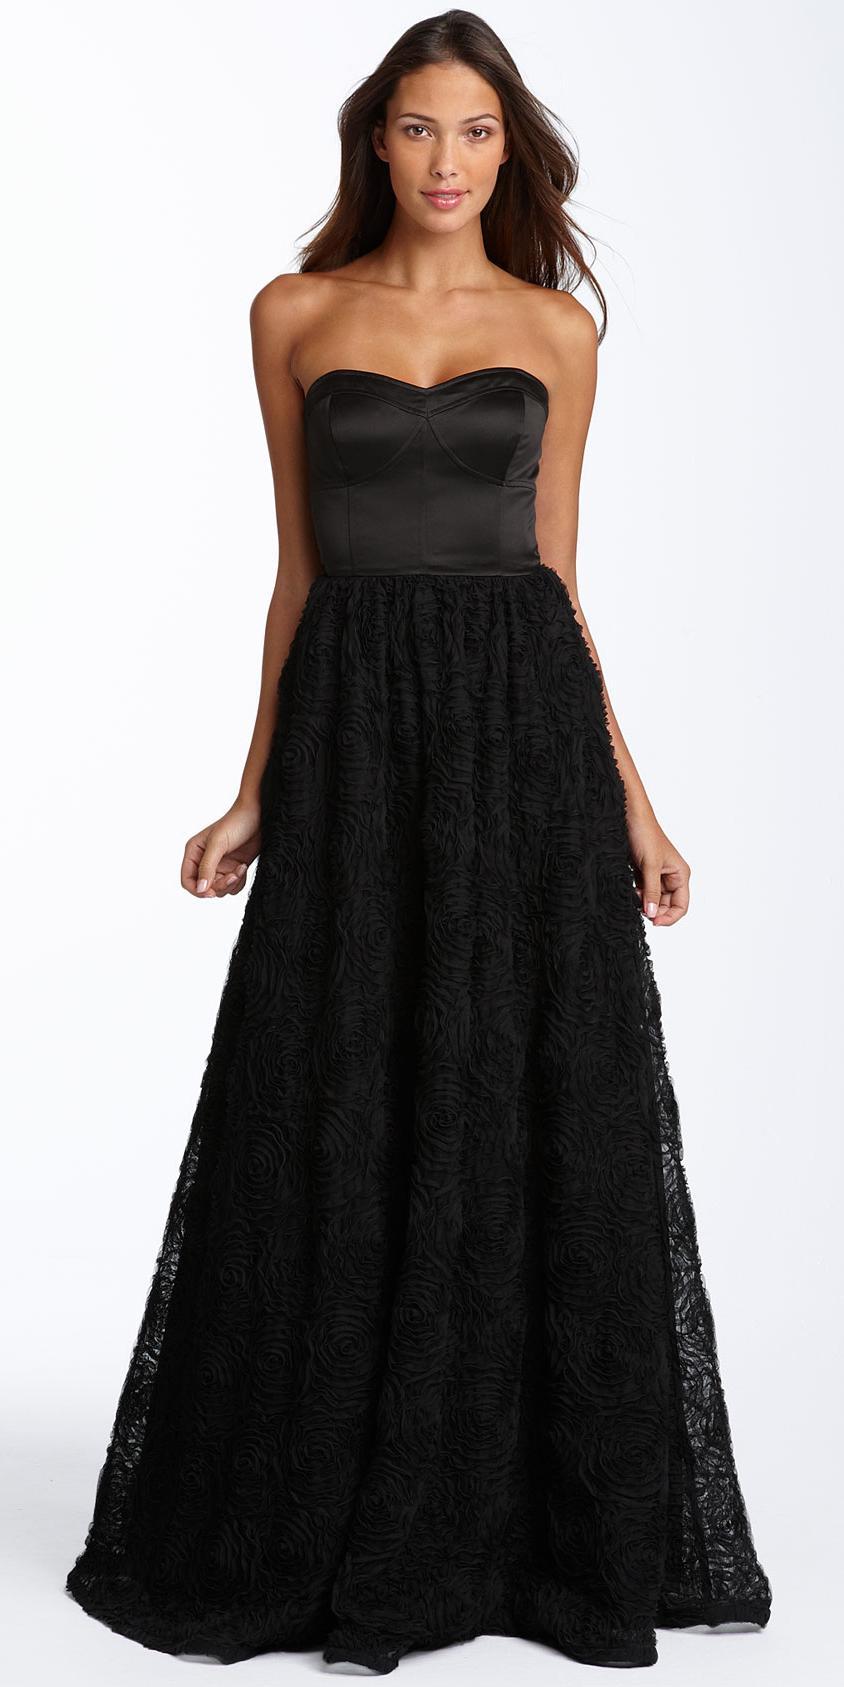 Images of Womens Long Black Dress - Reikian